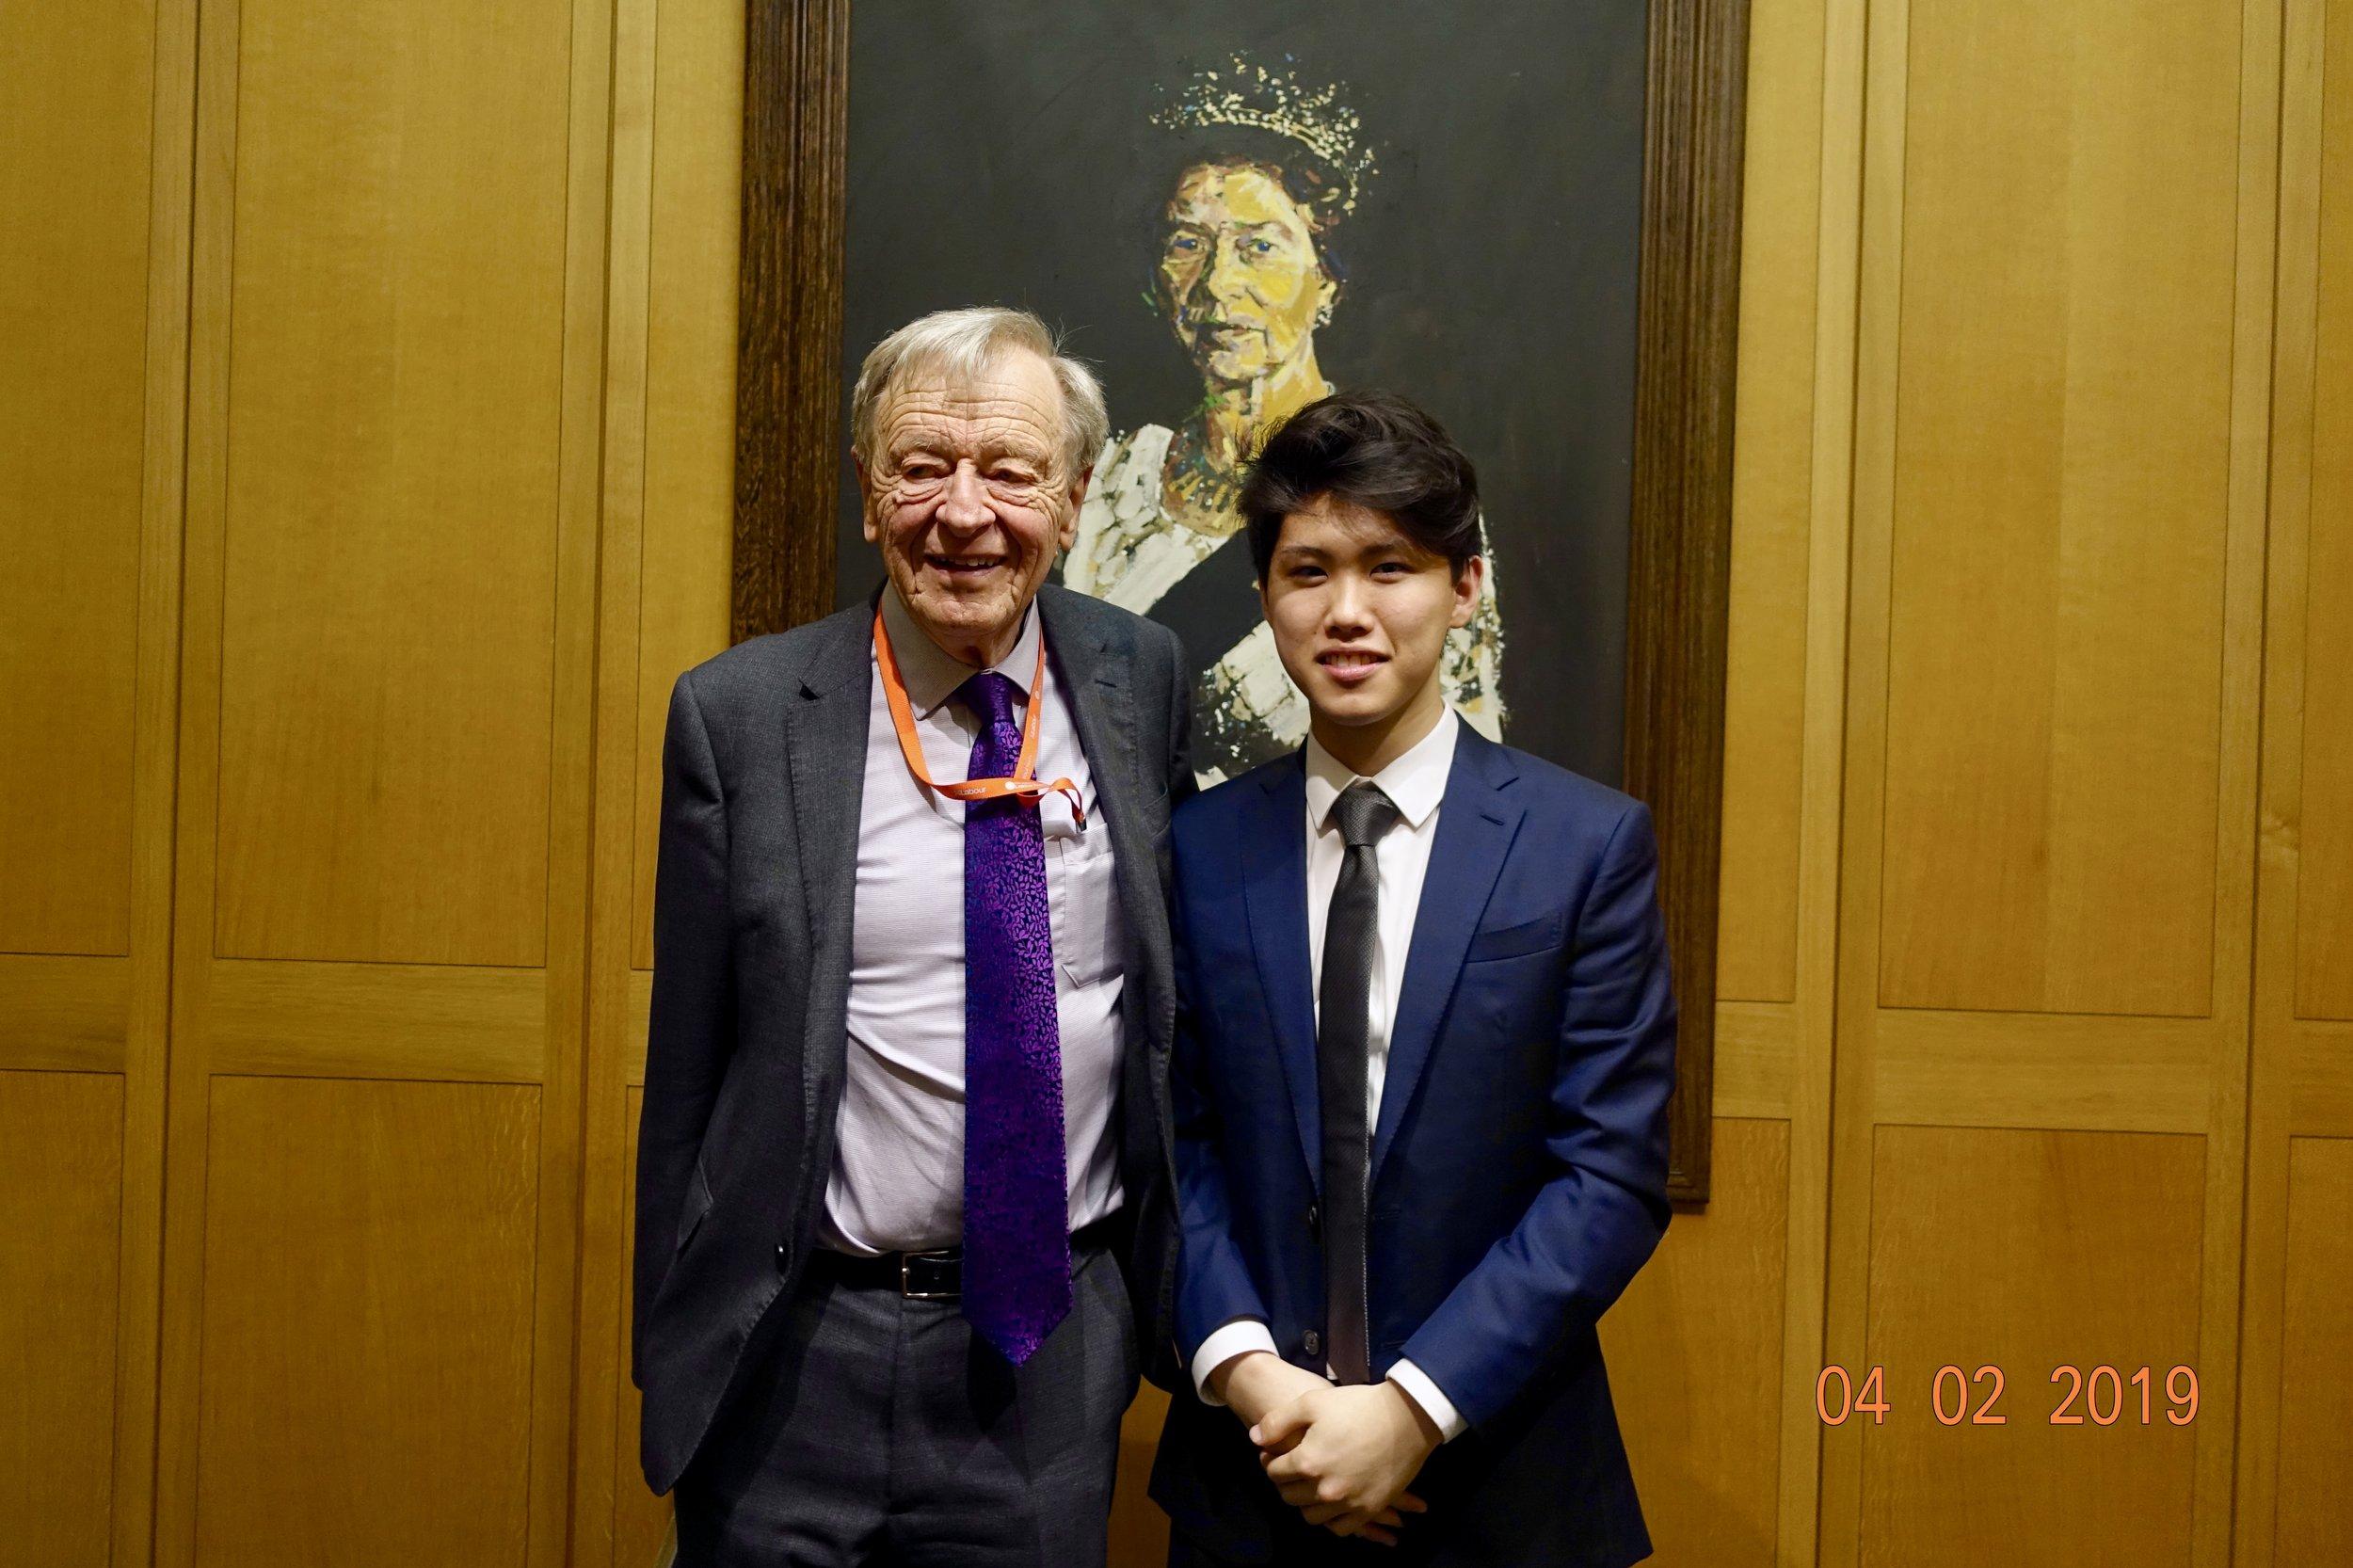 With Lord Alf Dubs, Holocaust Survivor & MP